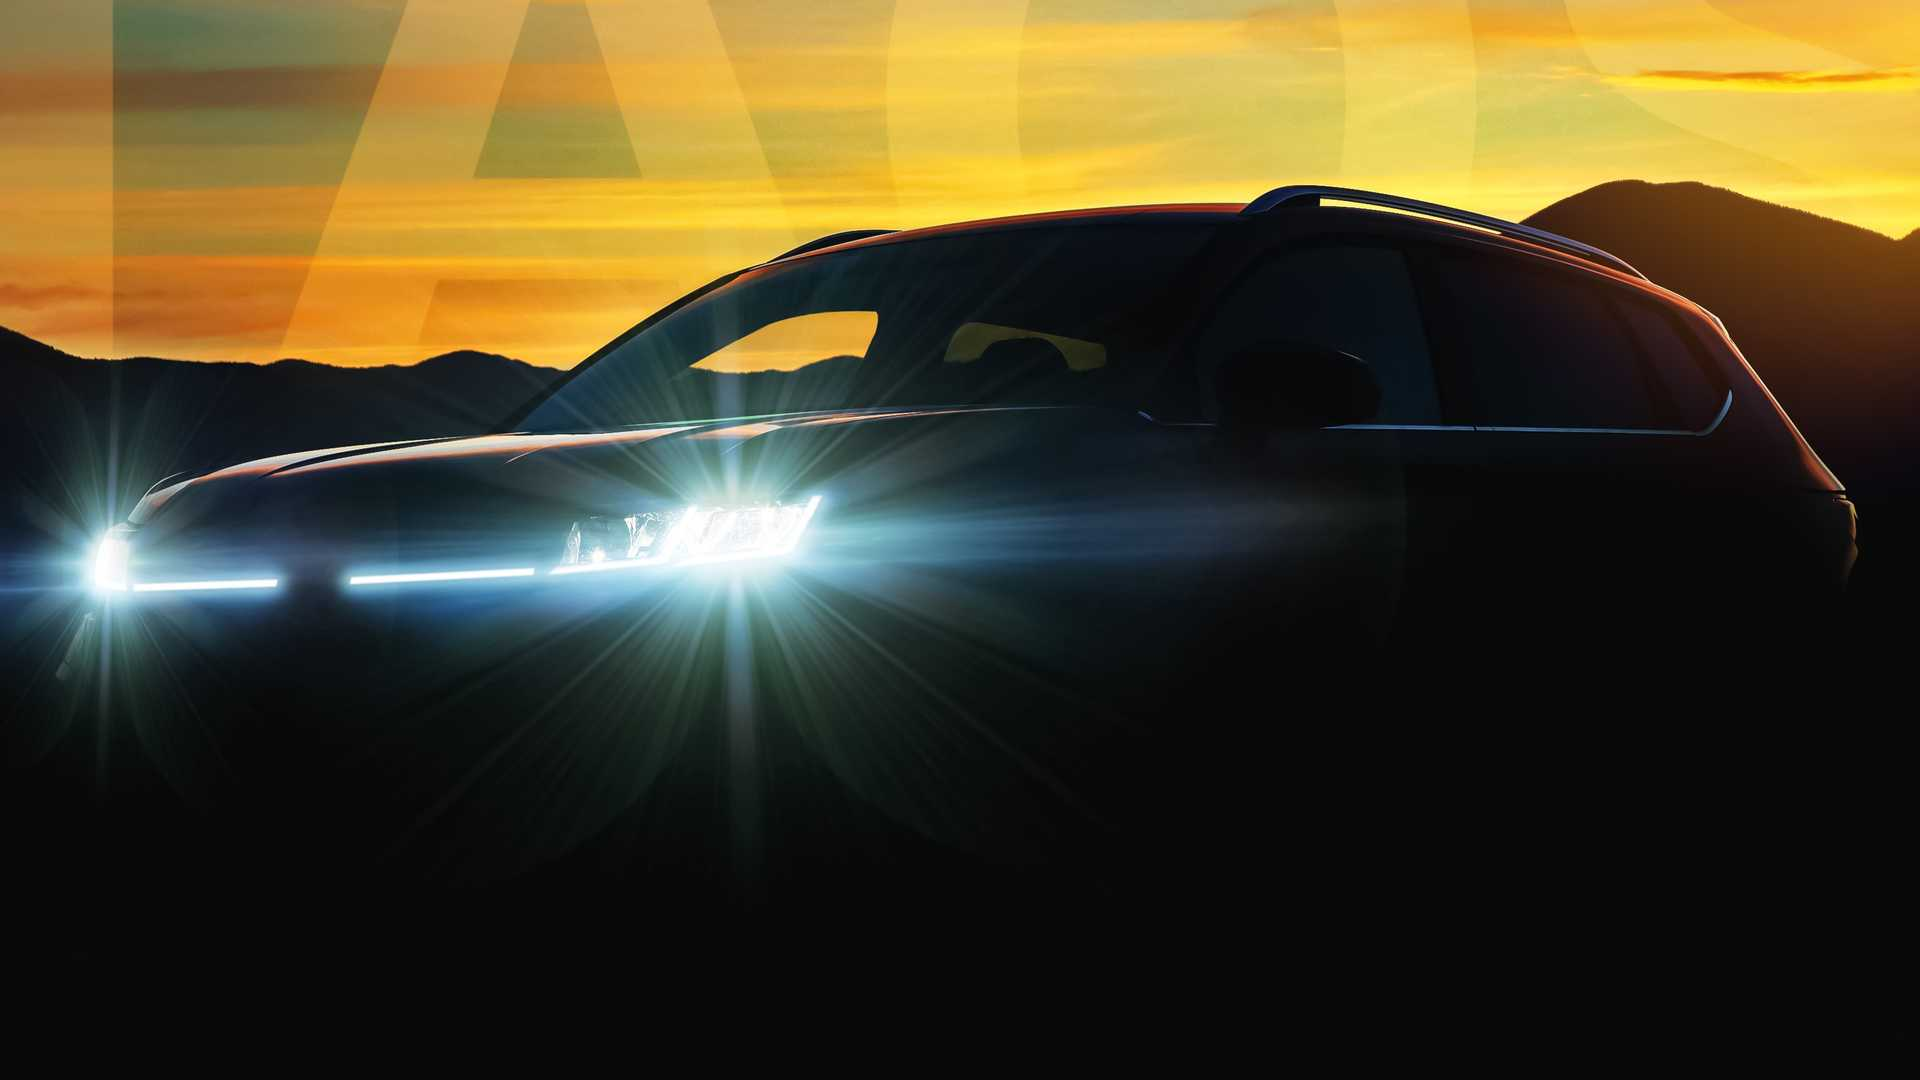 Volkswagen Taos Is Name For Upcoming Crossover Slotting Below Tiguan - Motor1